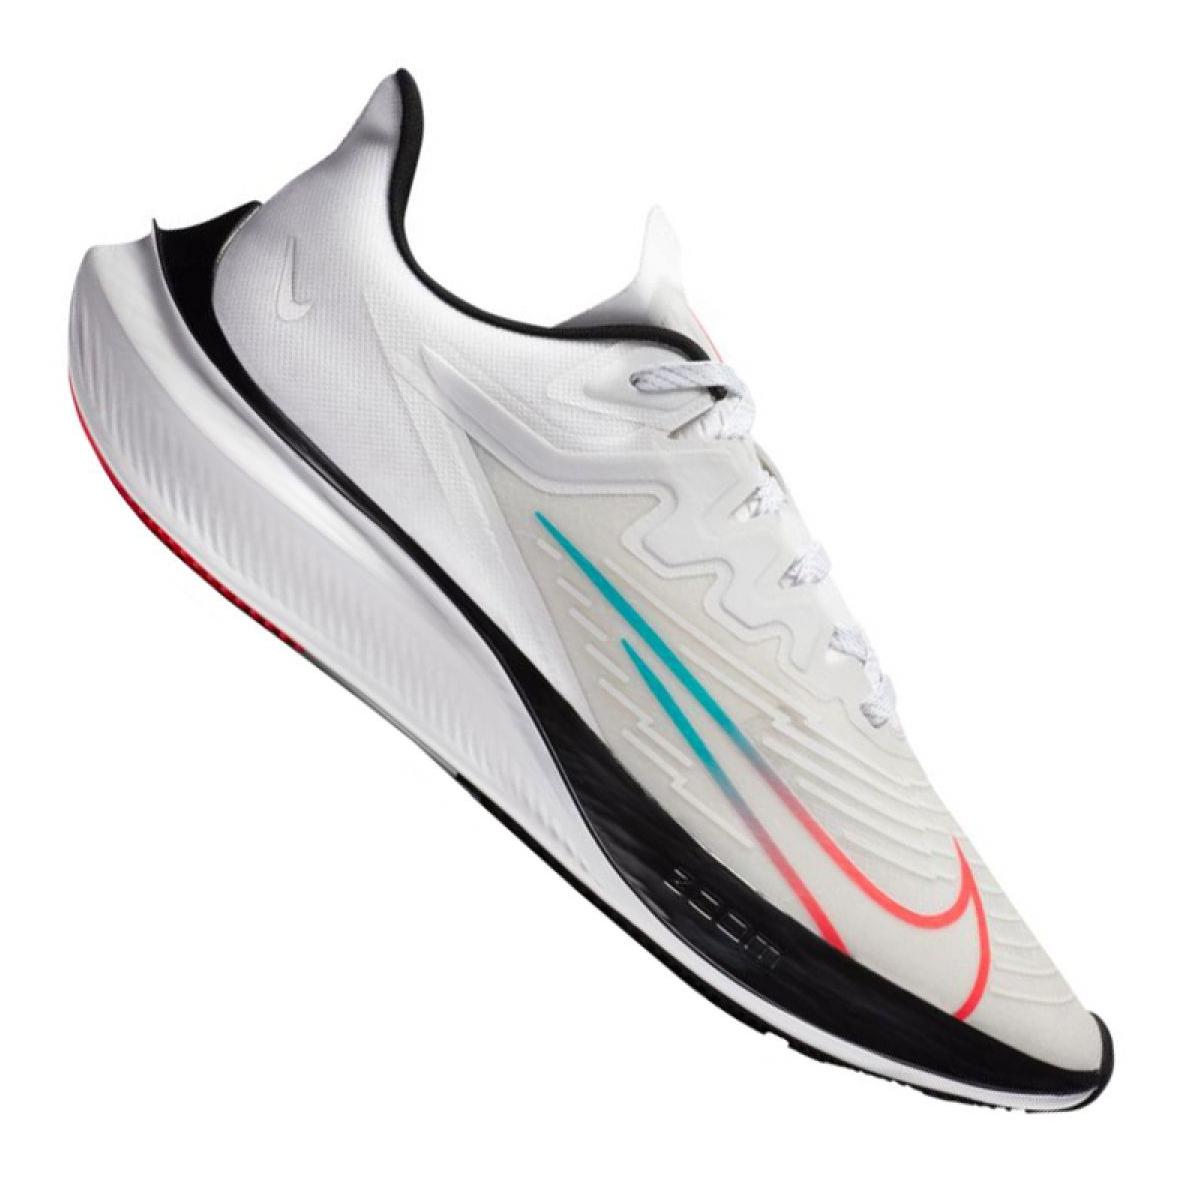 Nike Zoom Gravity 2 M CK2571-100